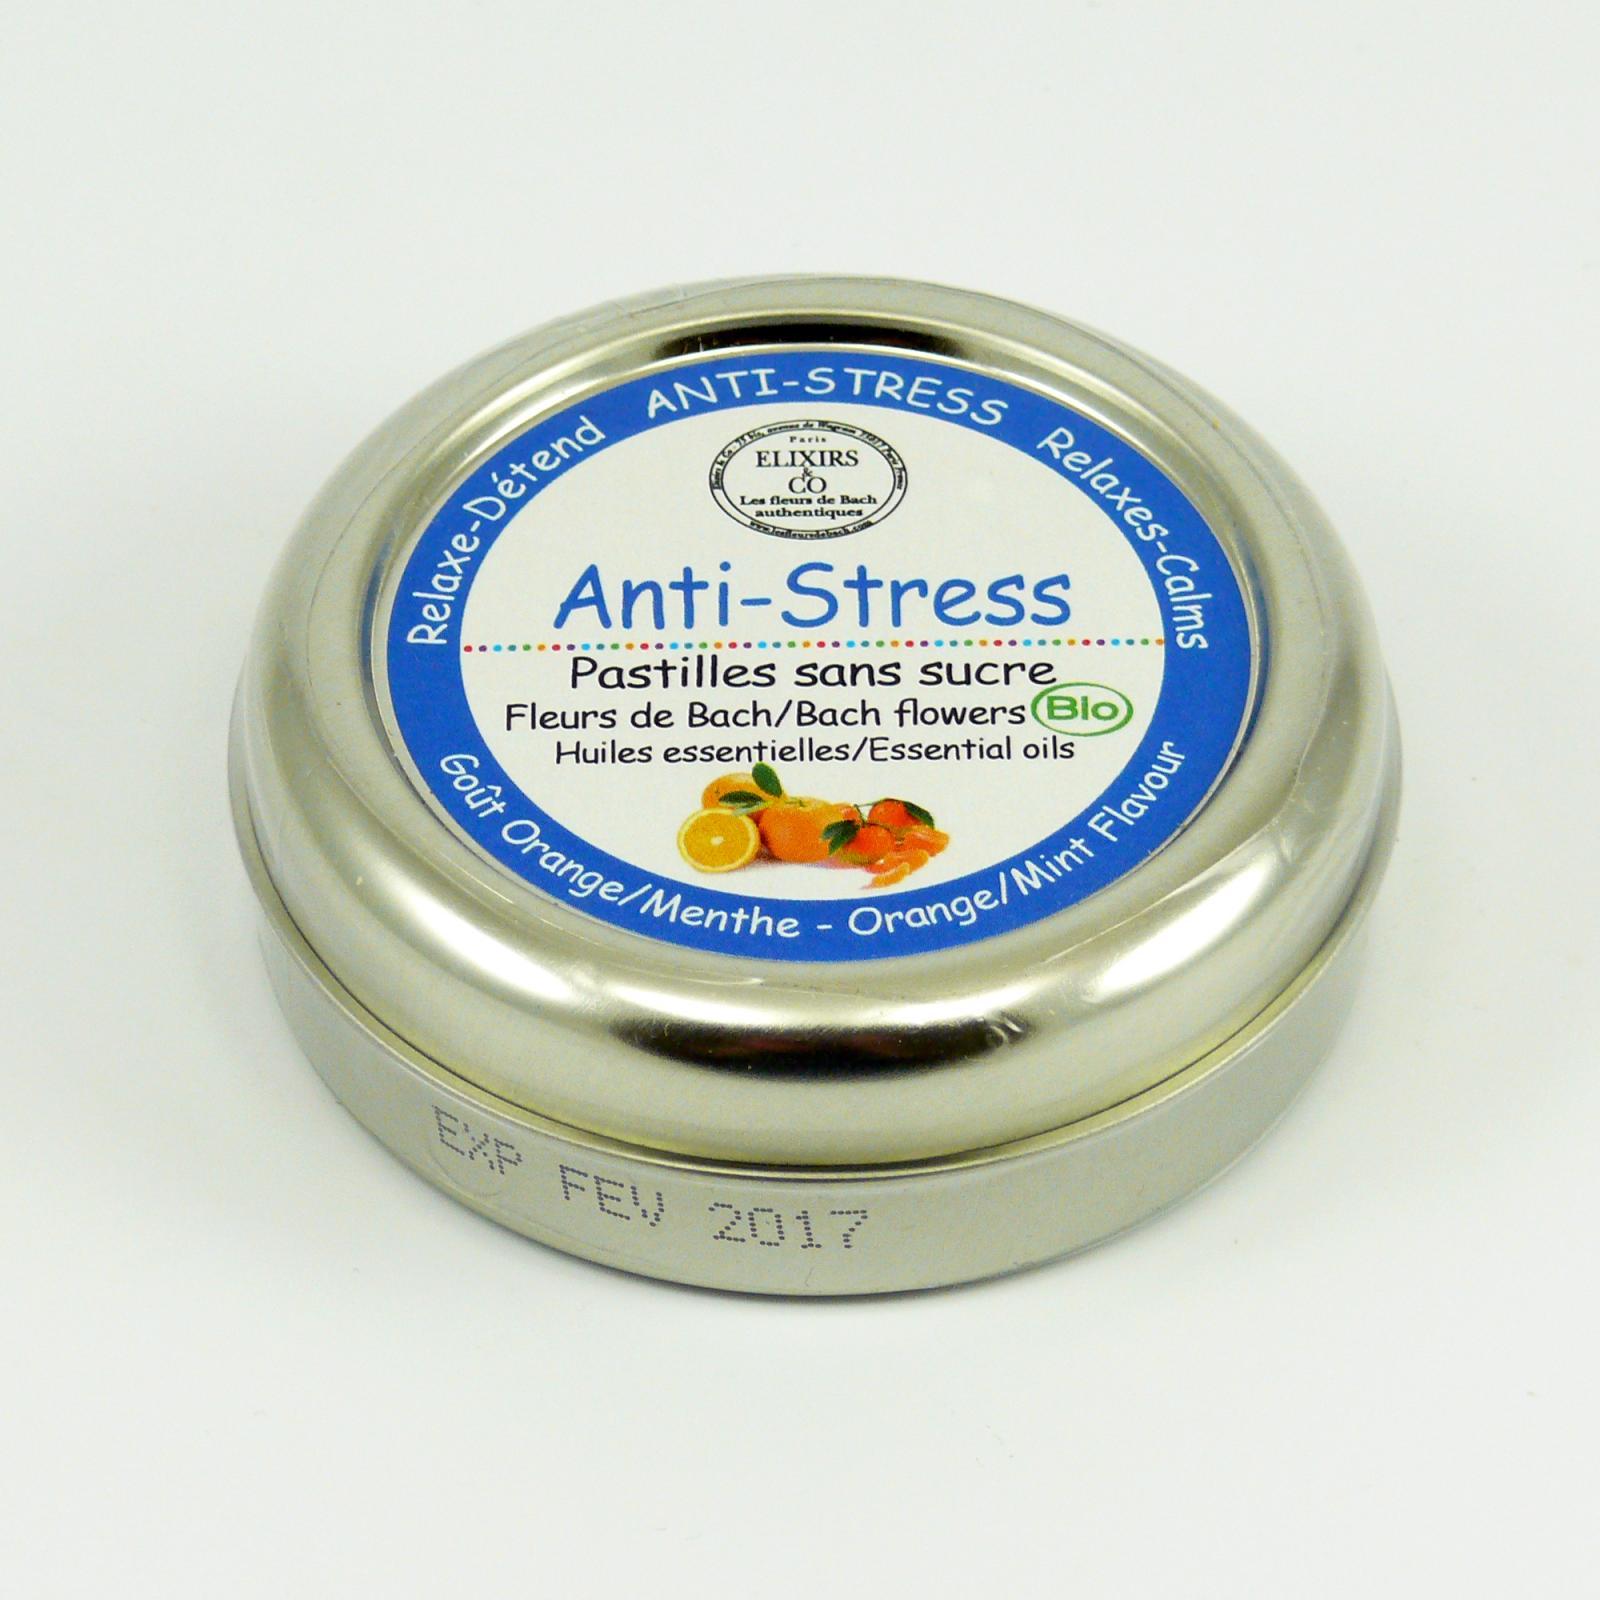 Les Fleurs de Bach Pastilky Bio-Bachovky anti-stres, pomeranč 45 ks, 45 g